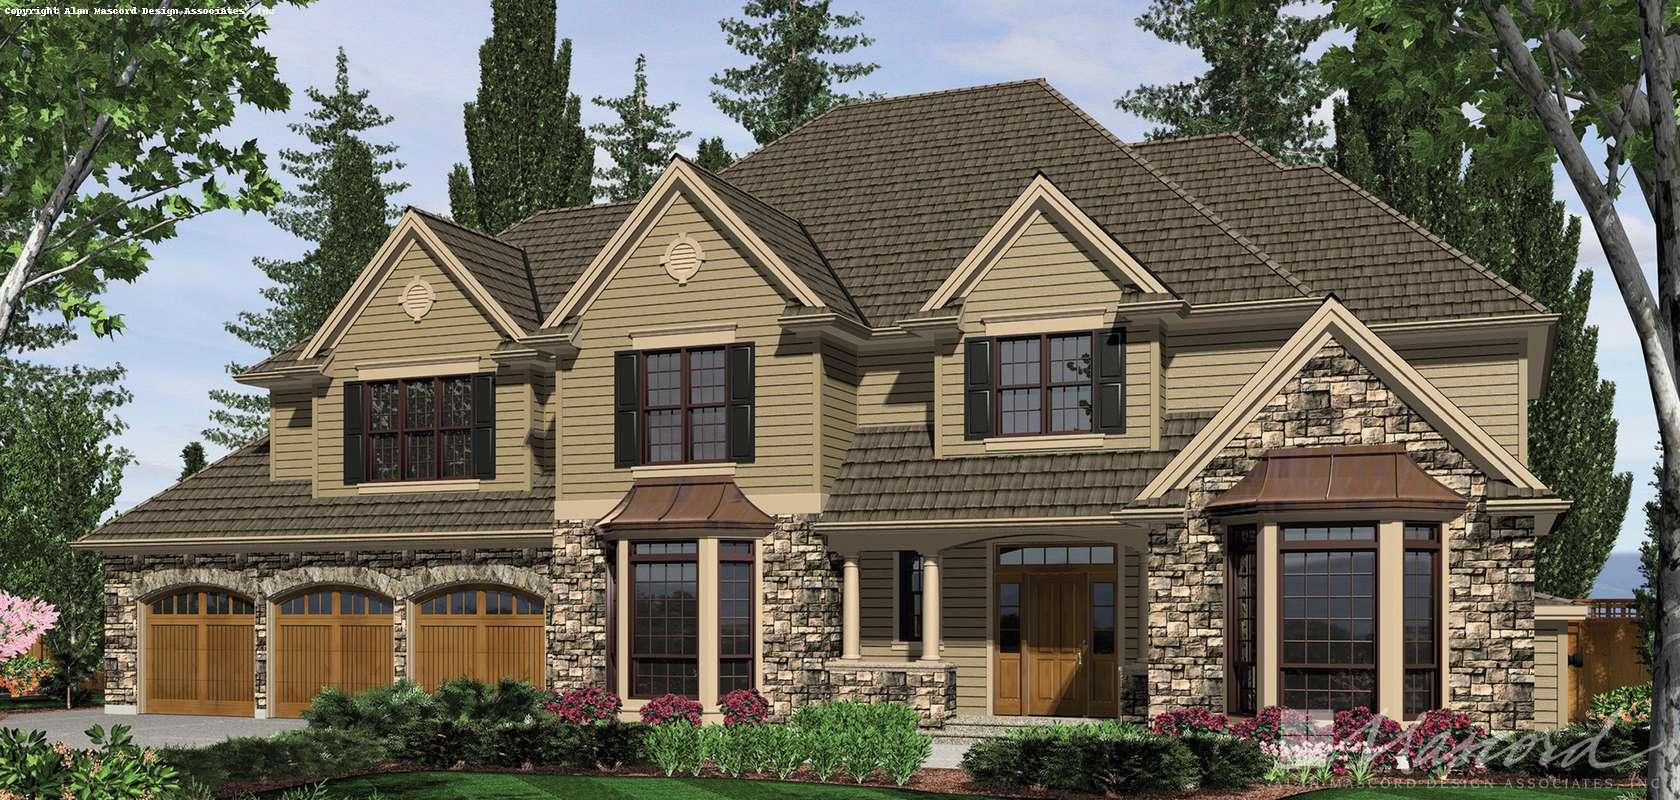 Mascord House Plan B2439: The Harwood